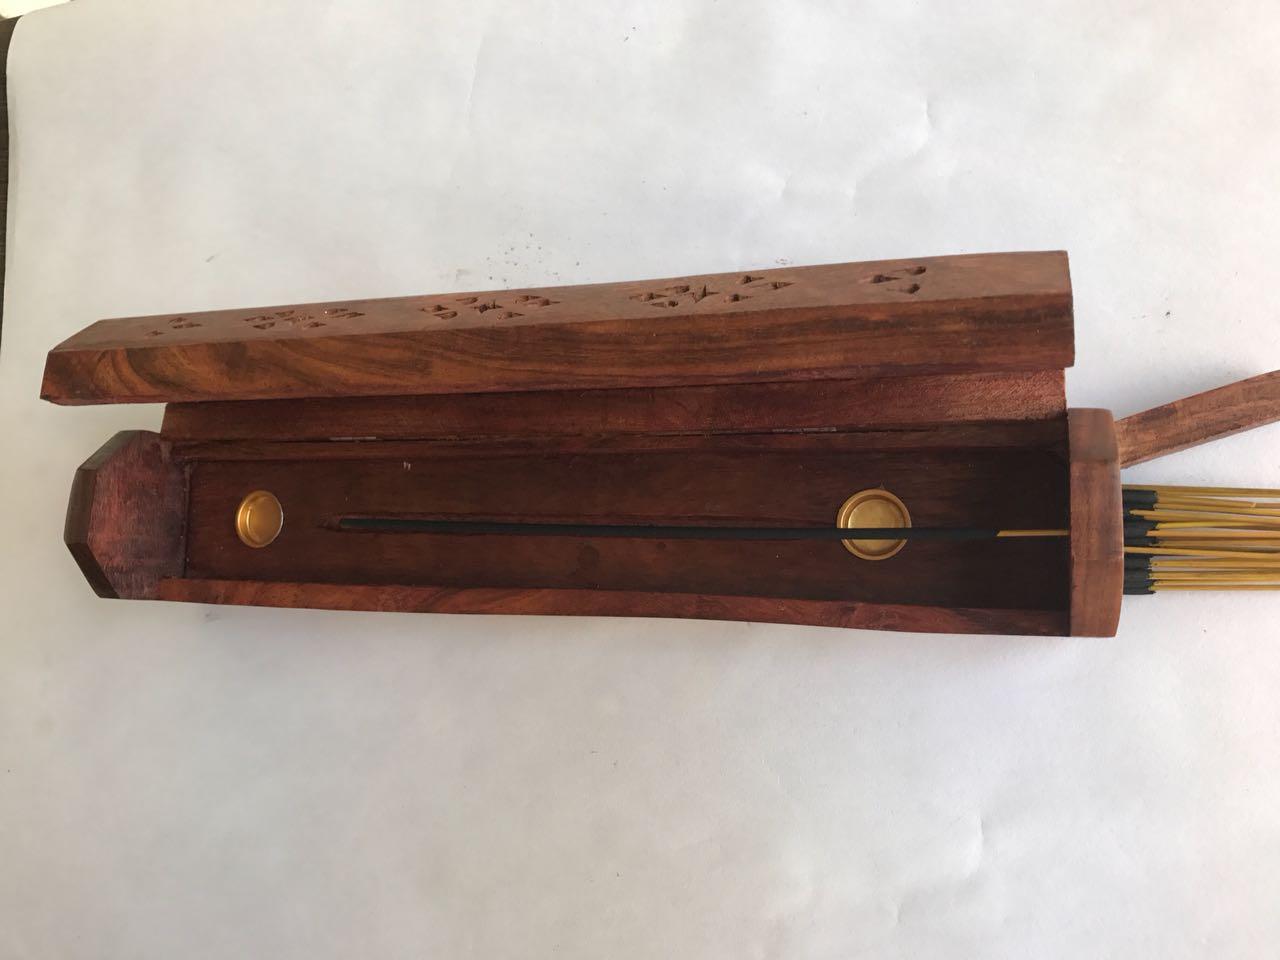 And Retails Elegant Handcrafted Sheesham Wood and Brass Agarbatti Holder  30 cm x 5 cm x 6 cm, Brown